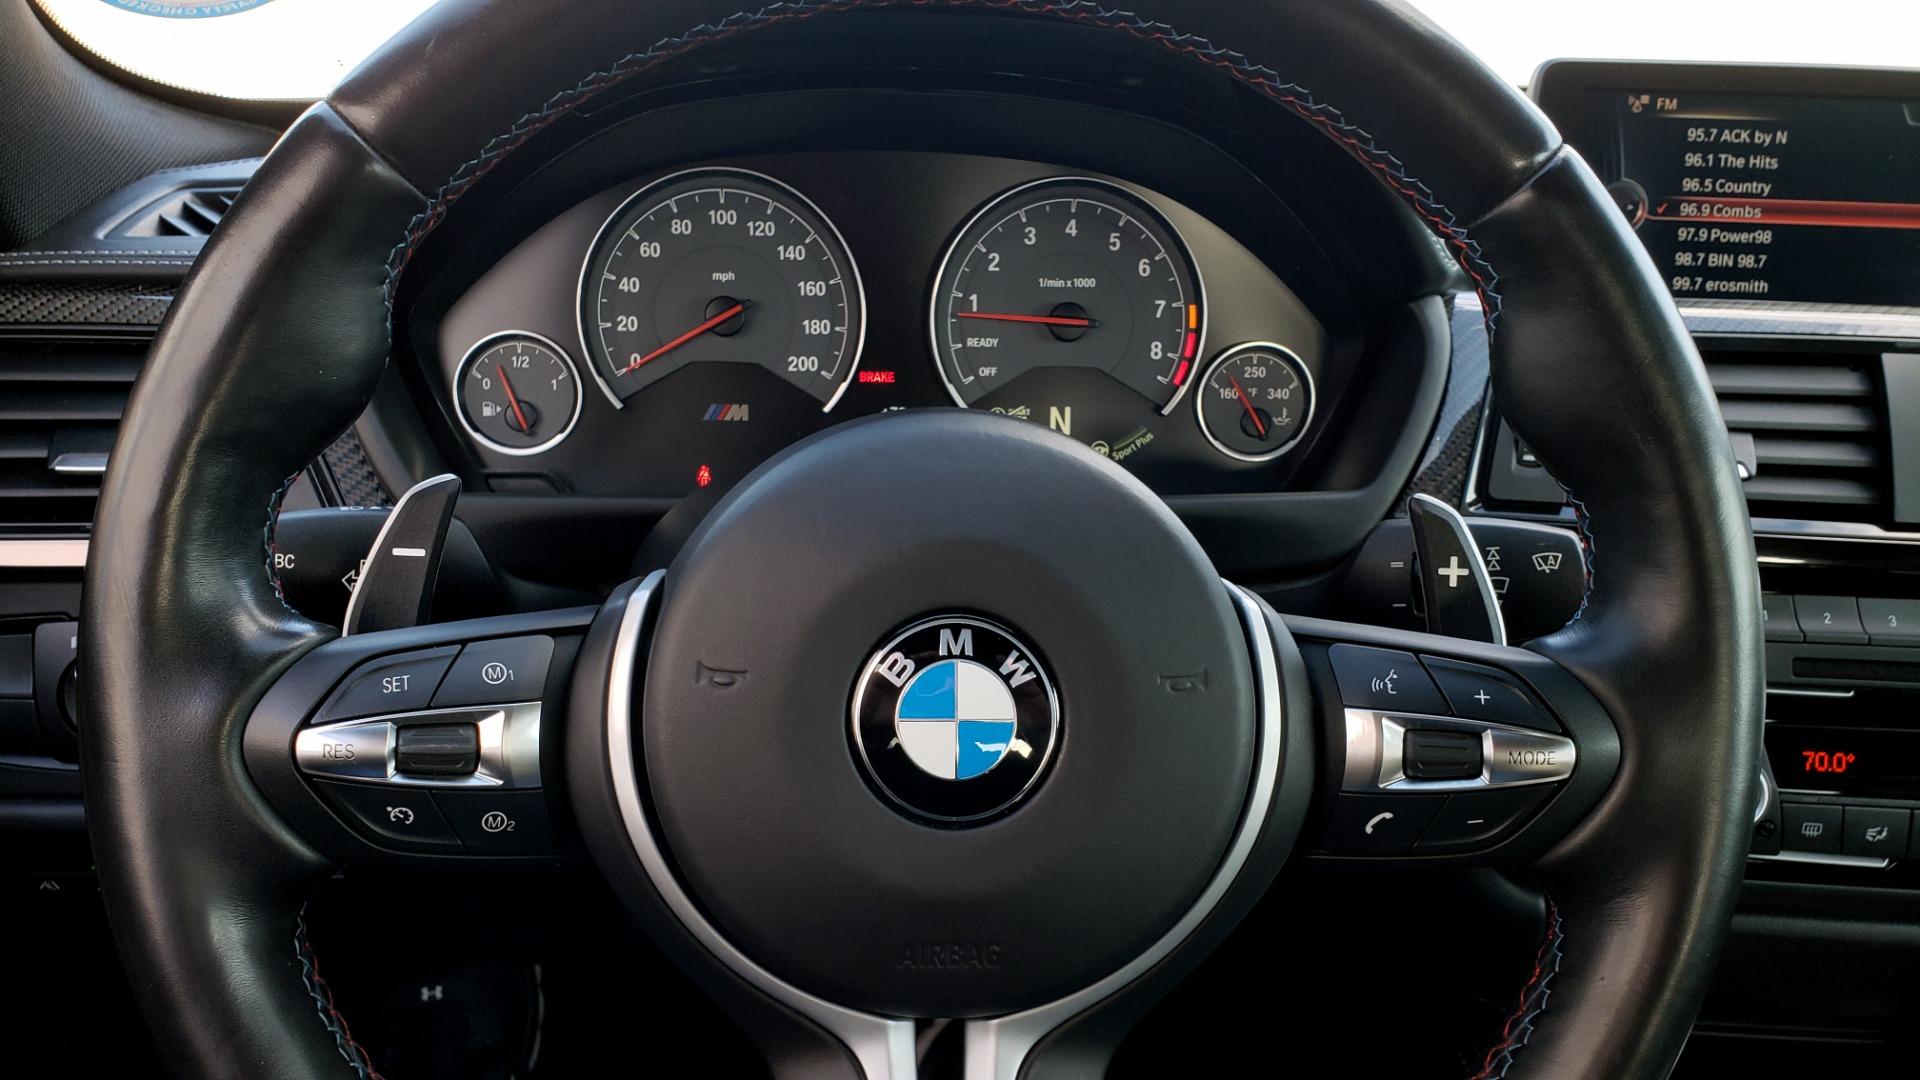 Used 2015 BMW M4 COUPE / EXEC PKG / DRVR ASST PLUS / LIGHTING / M-SUSPENSION for sale Sold at Formula Imports in Charlotte NC 28227 47